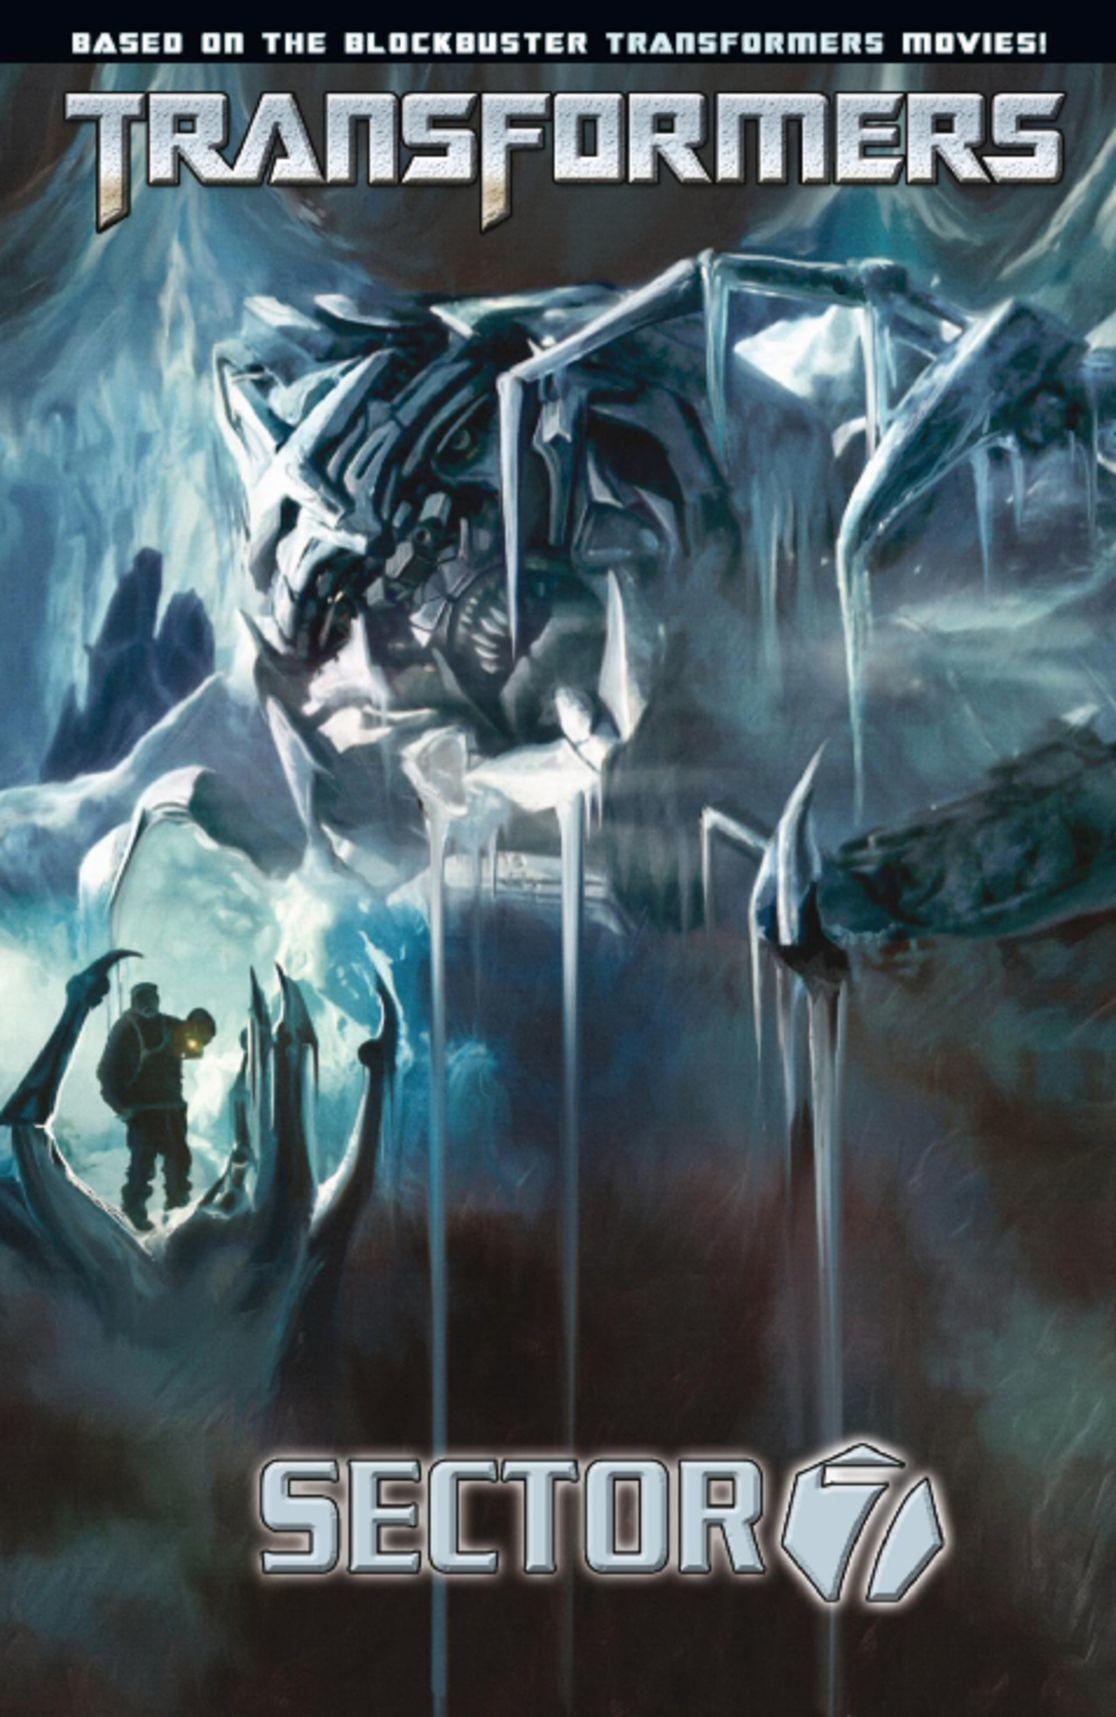 Transformers Sector 7 Digital